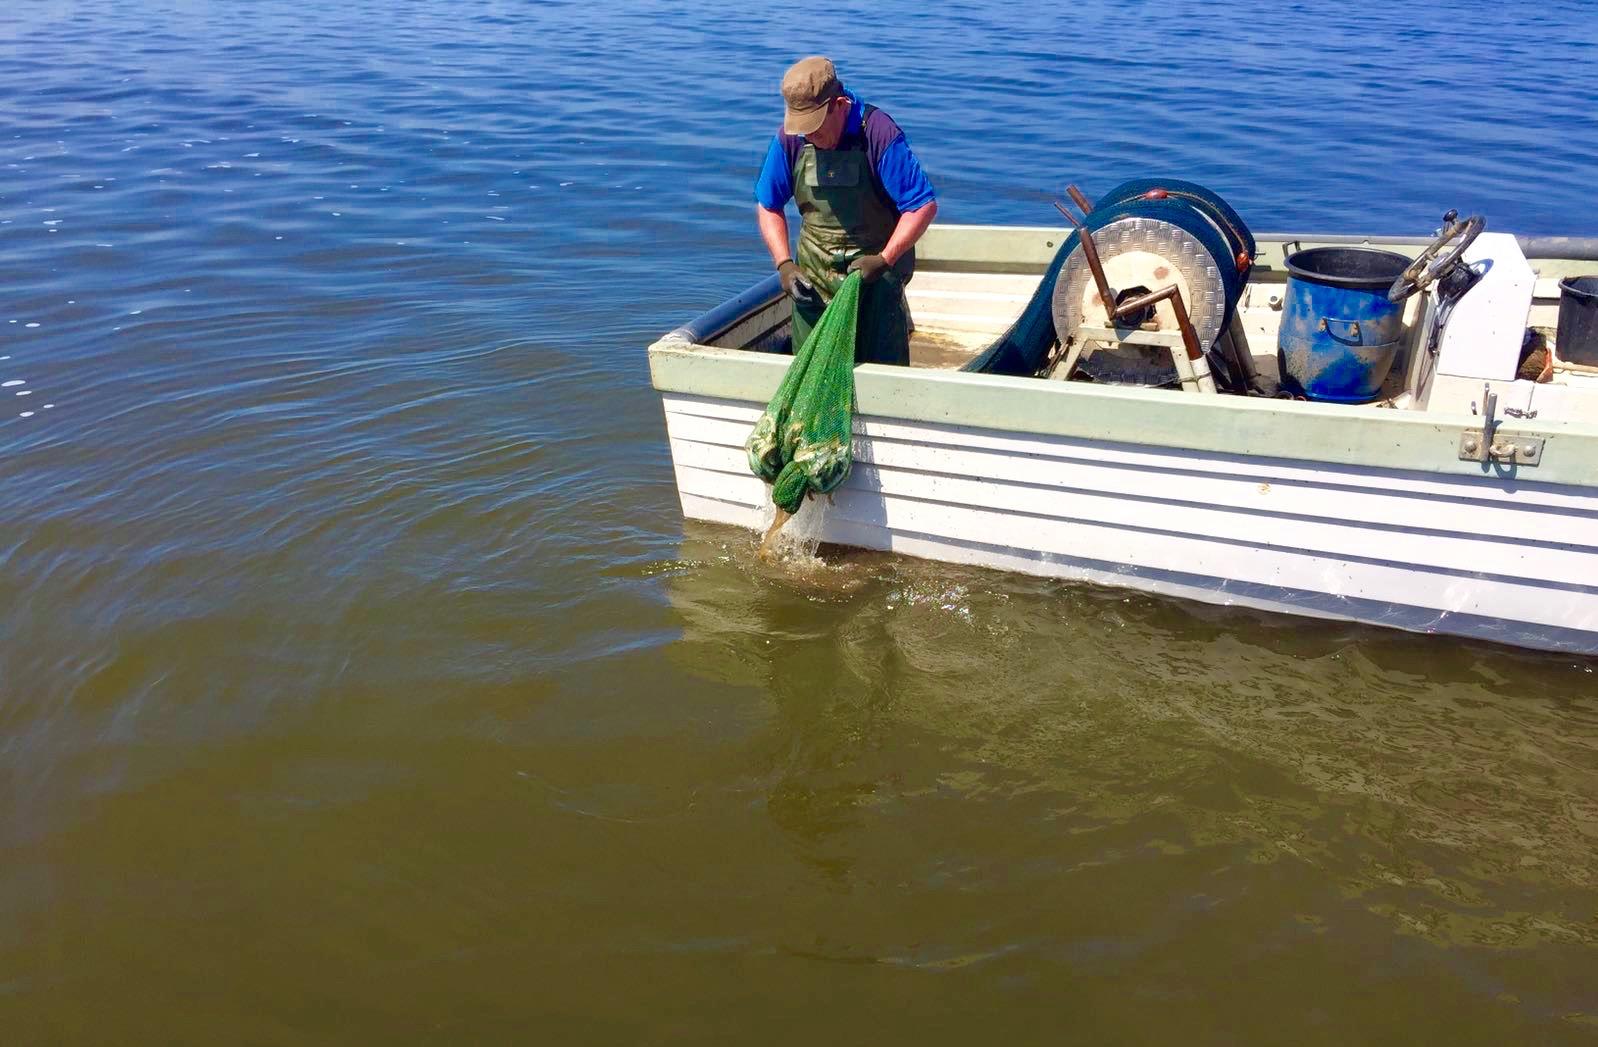 Lough Neagh Fishermen